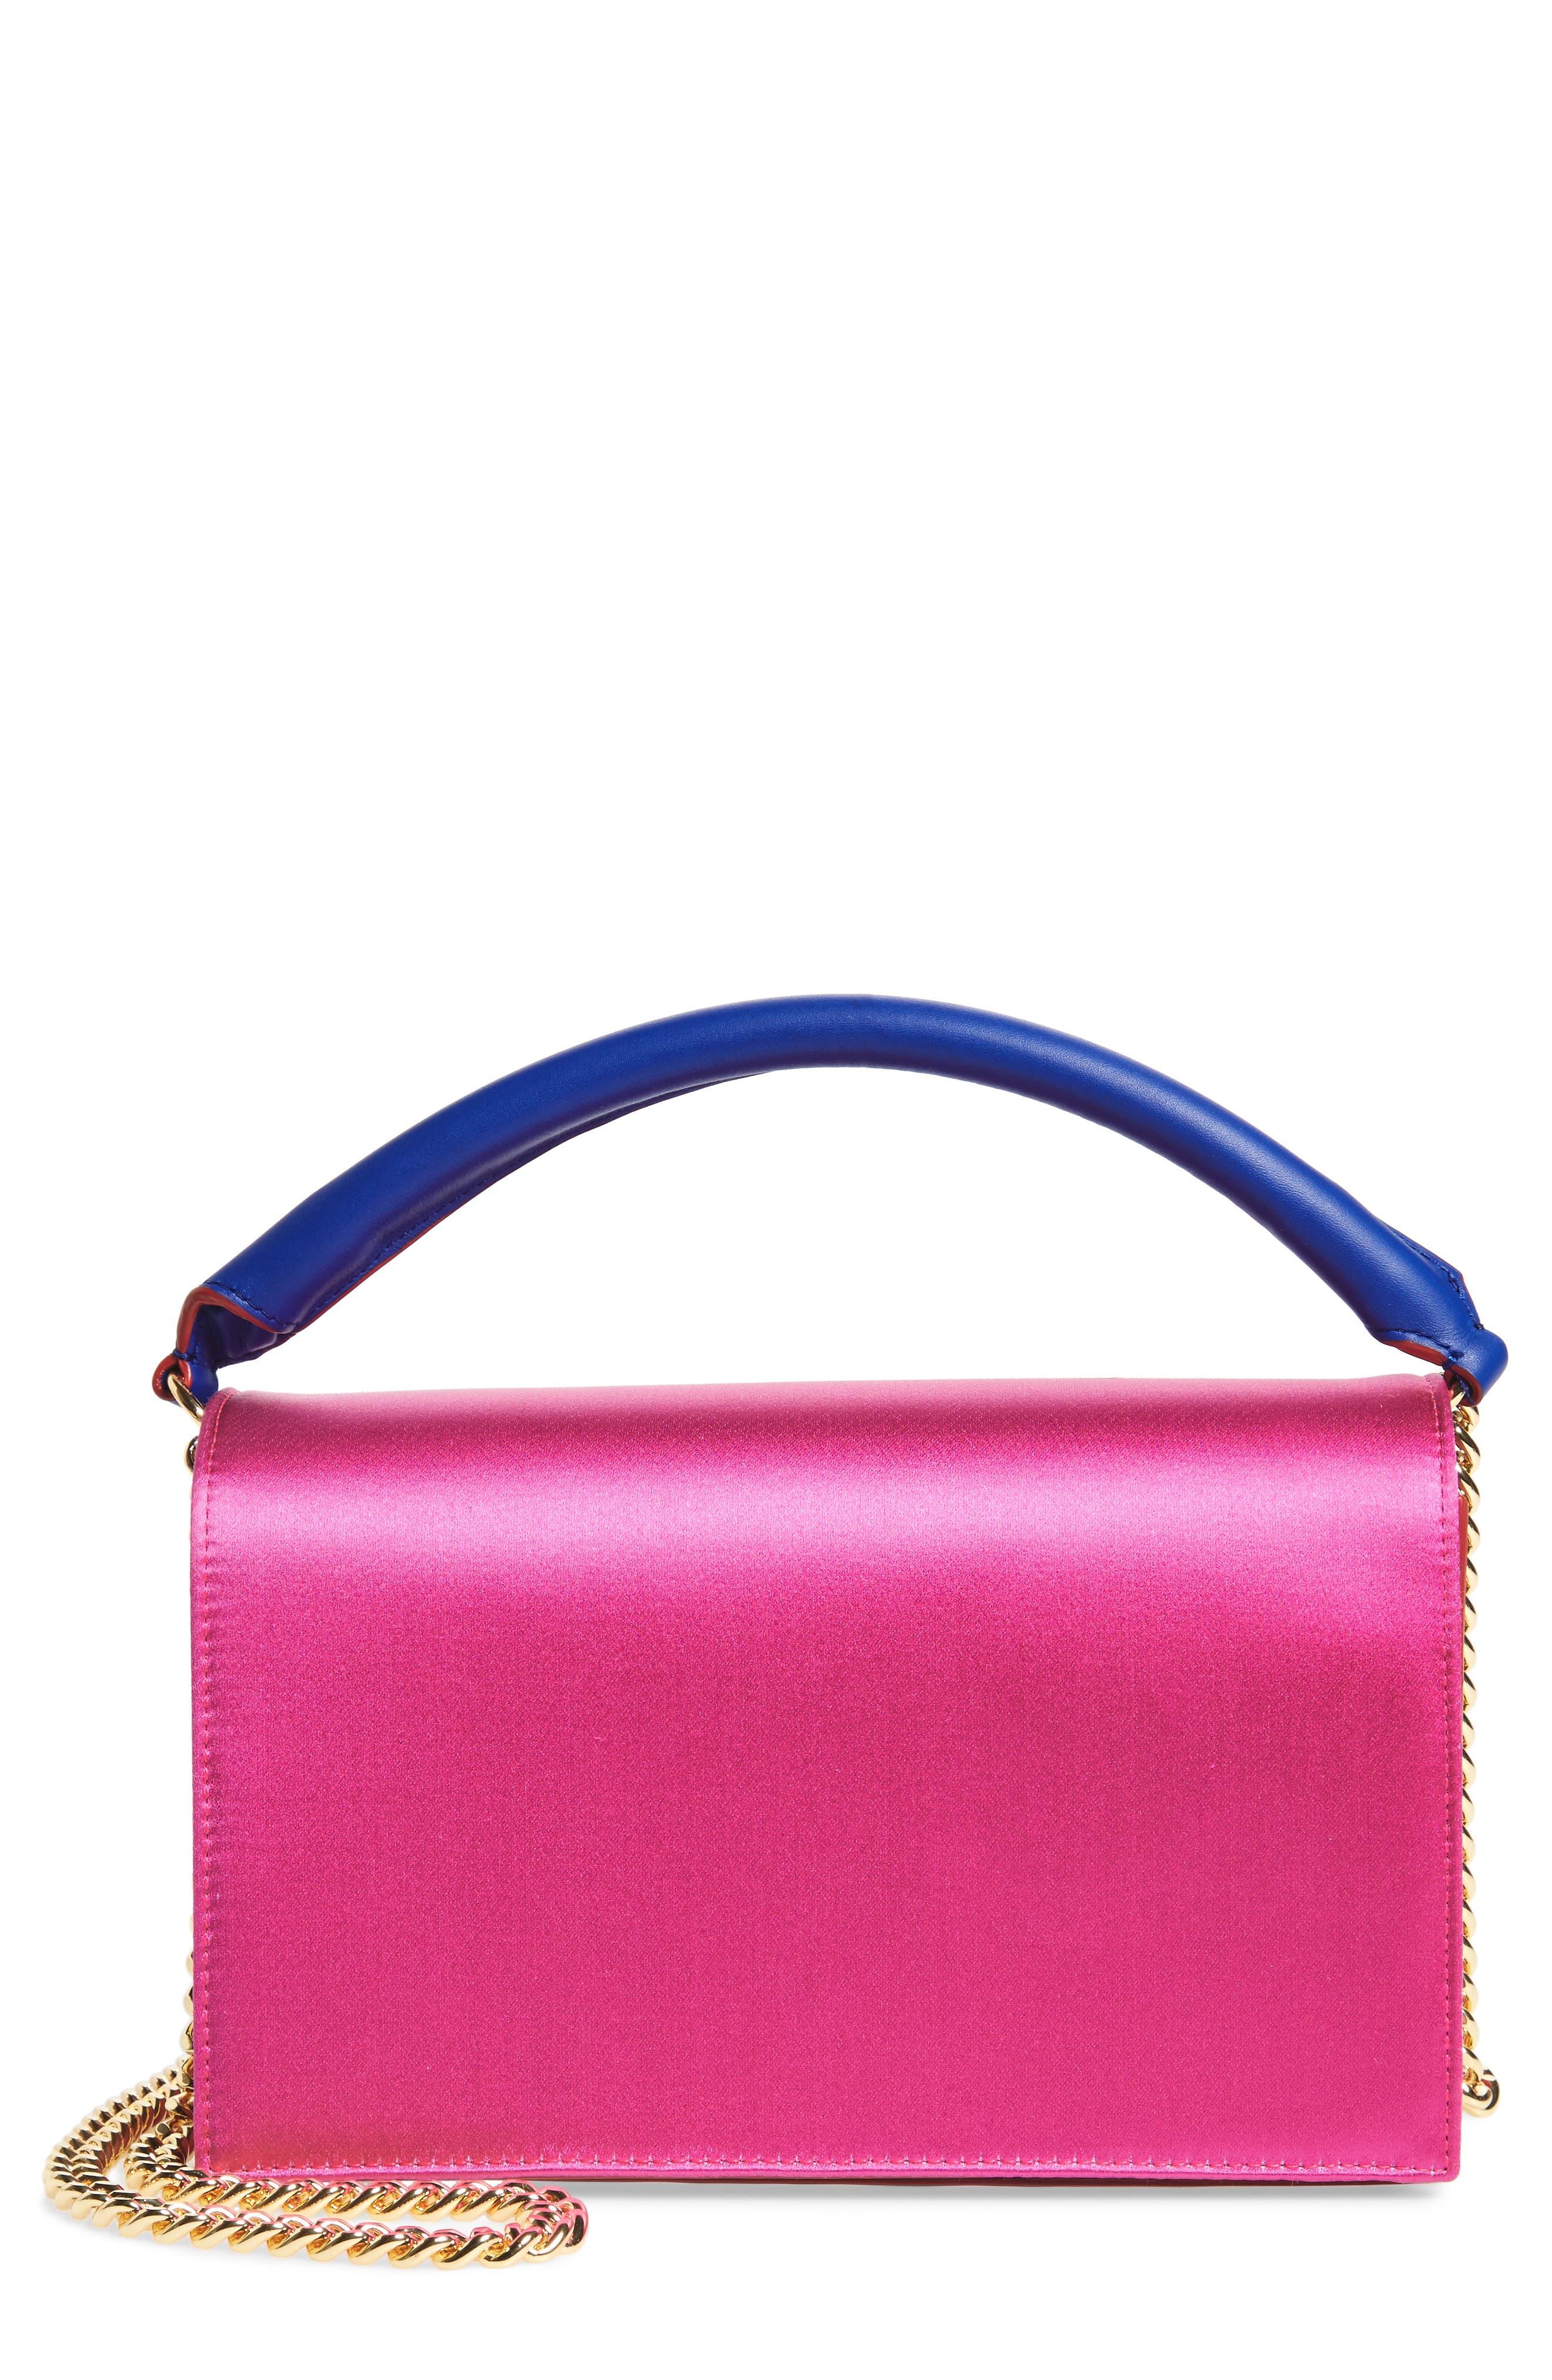 Soirée Satin & Leather Top Handle Bag,                             Alternate thumbnail 3, color,                             Pink